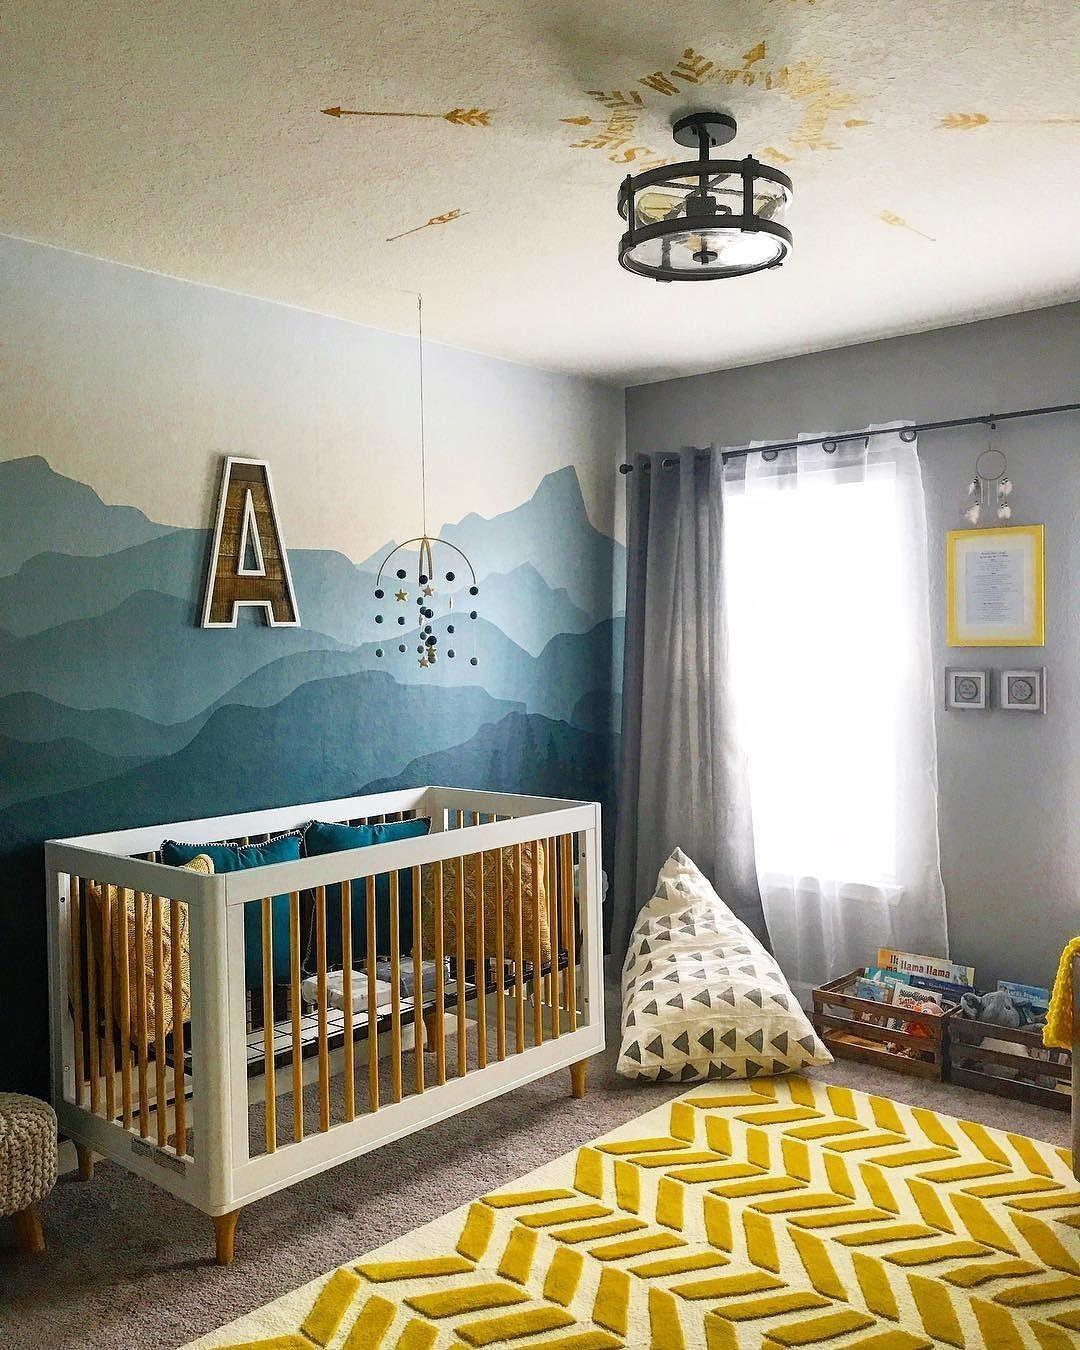 Mustard Yellow And Teal Blue Nursery With Mountain Wallpaper Mural Nurserydecor Nurseryideas Wood Baby Room Themes Baby Room Interior Design Boys Room Decor